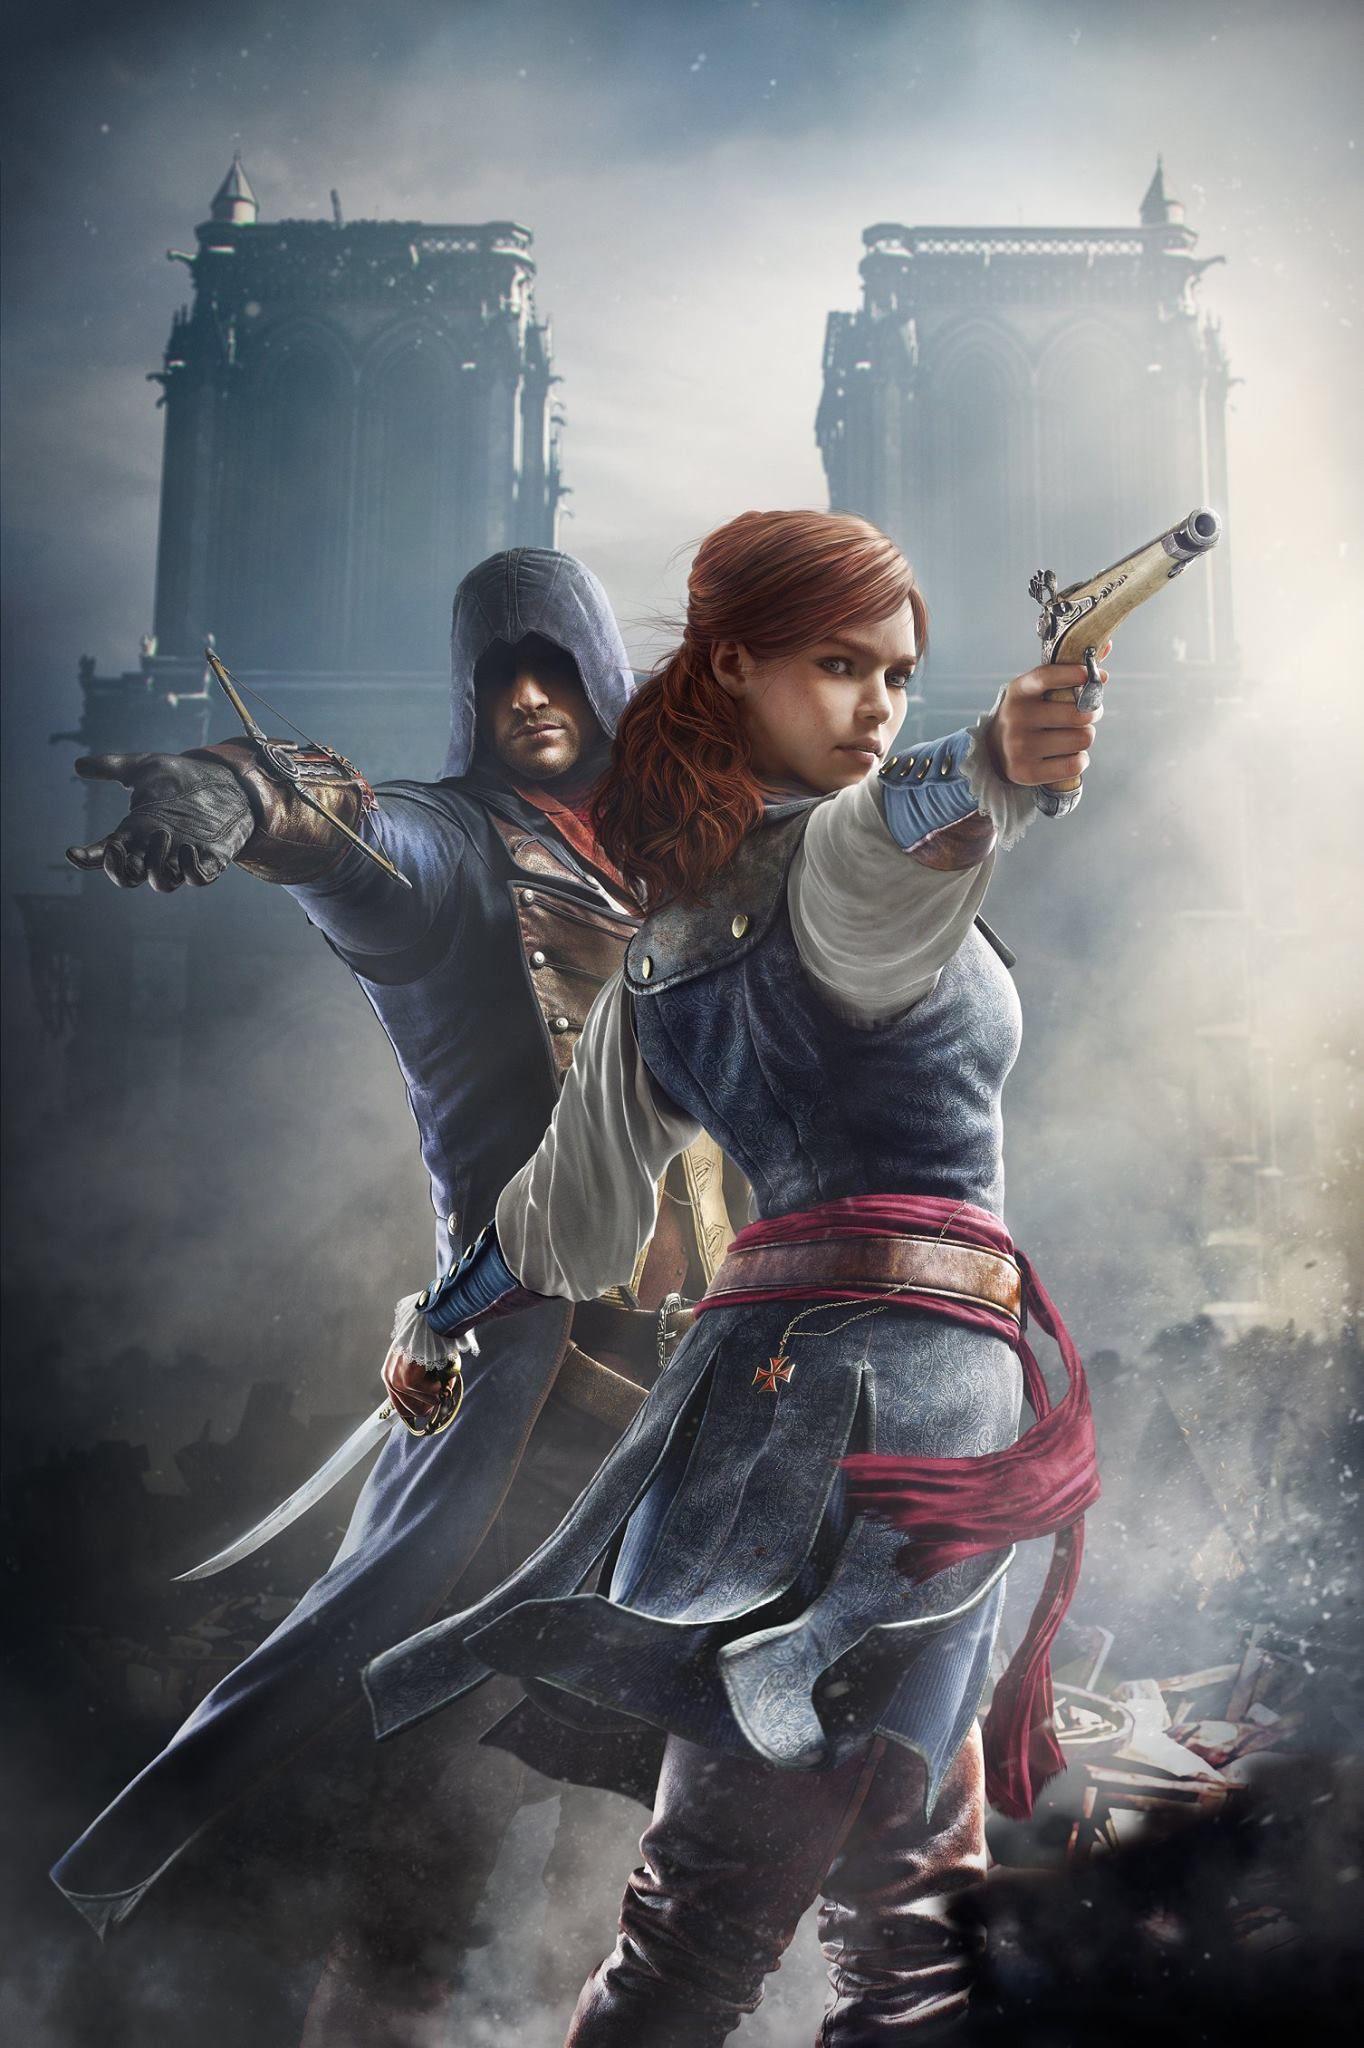 Arno Victor Dorian And Elise De La Serre Assassins Creed Unity Arno Assassin S Creed Assassins Creed